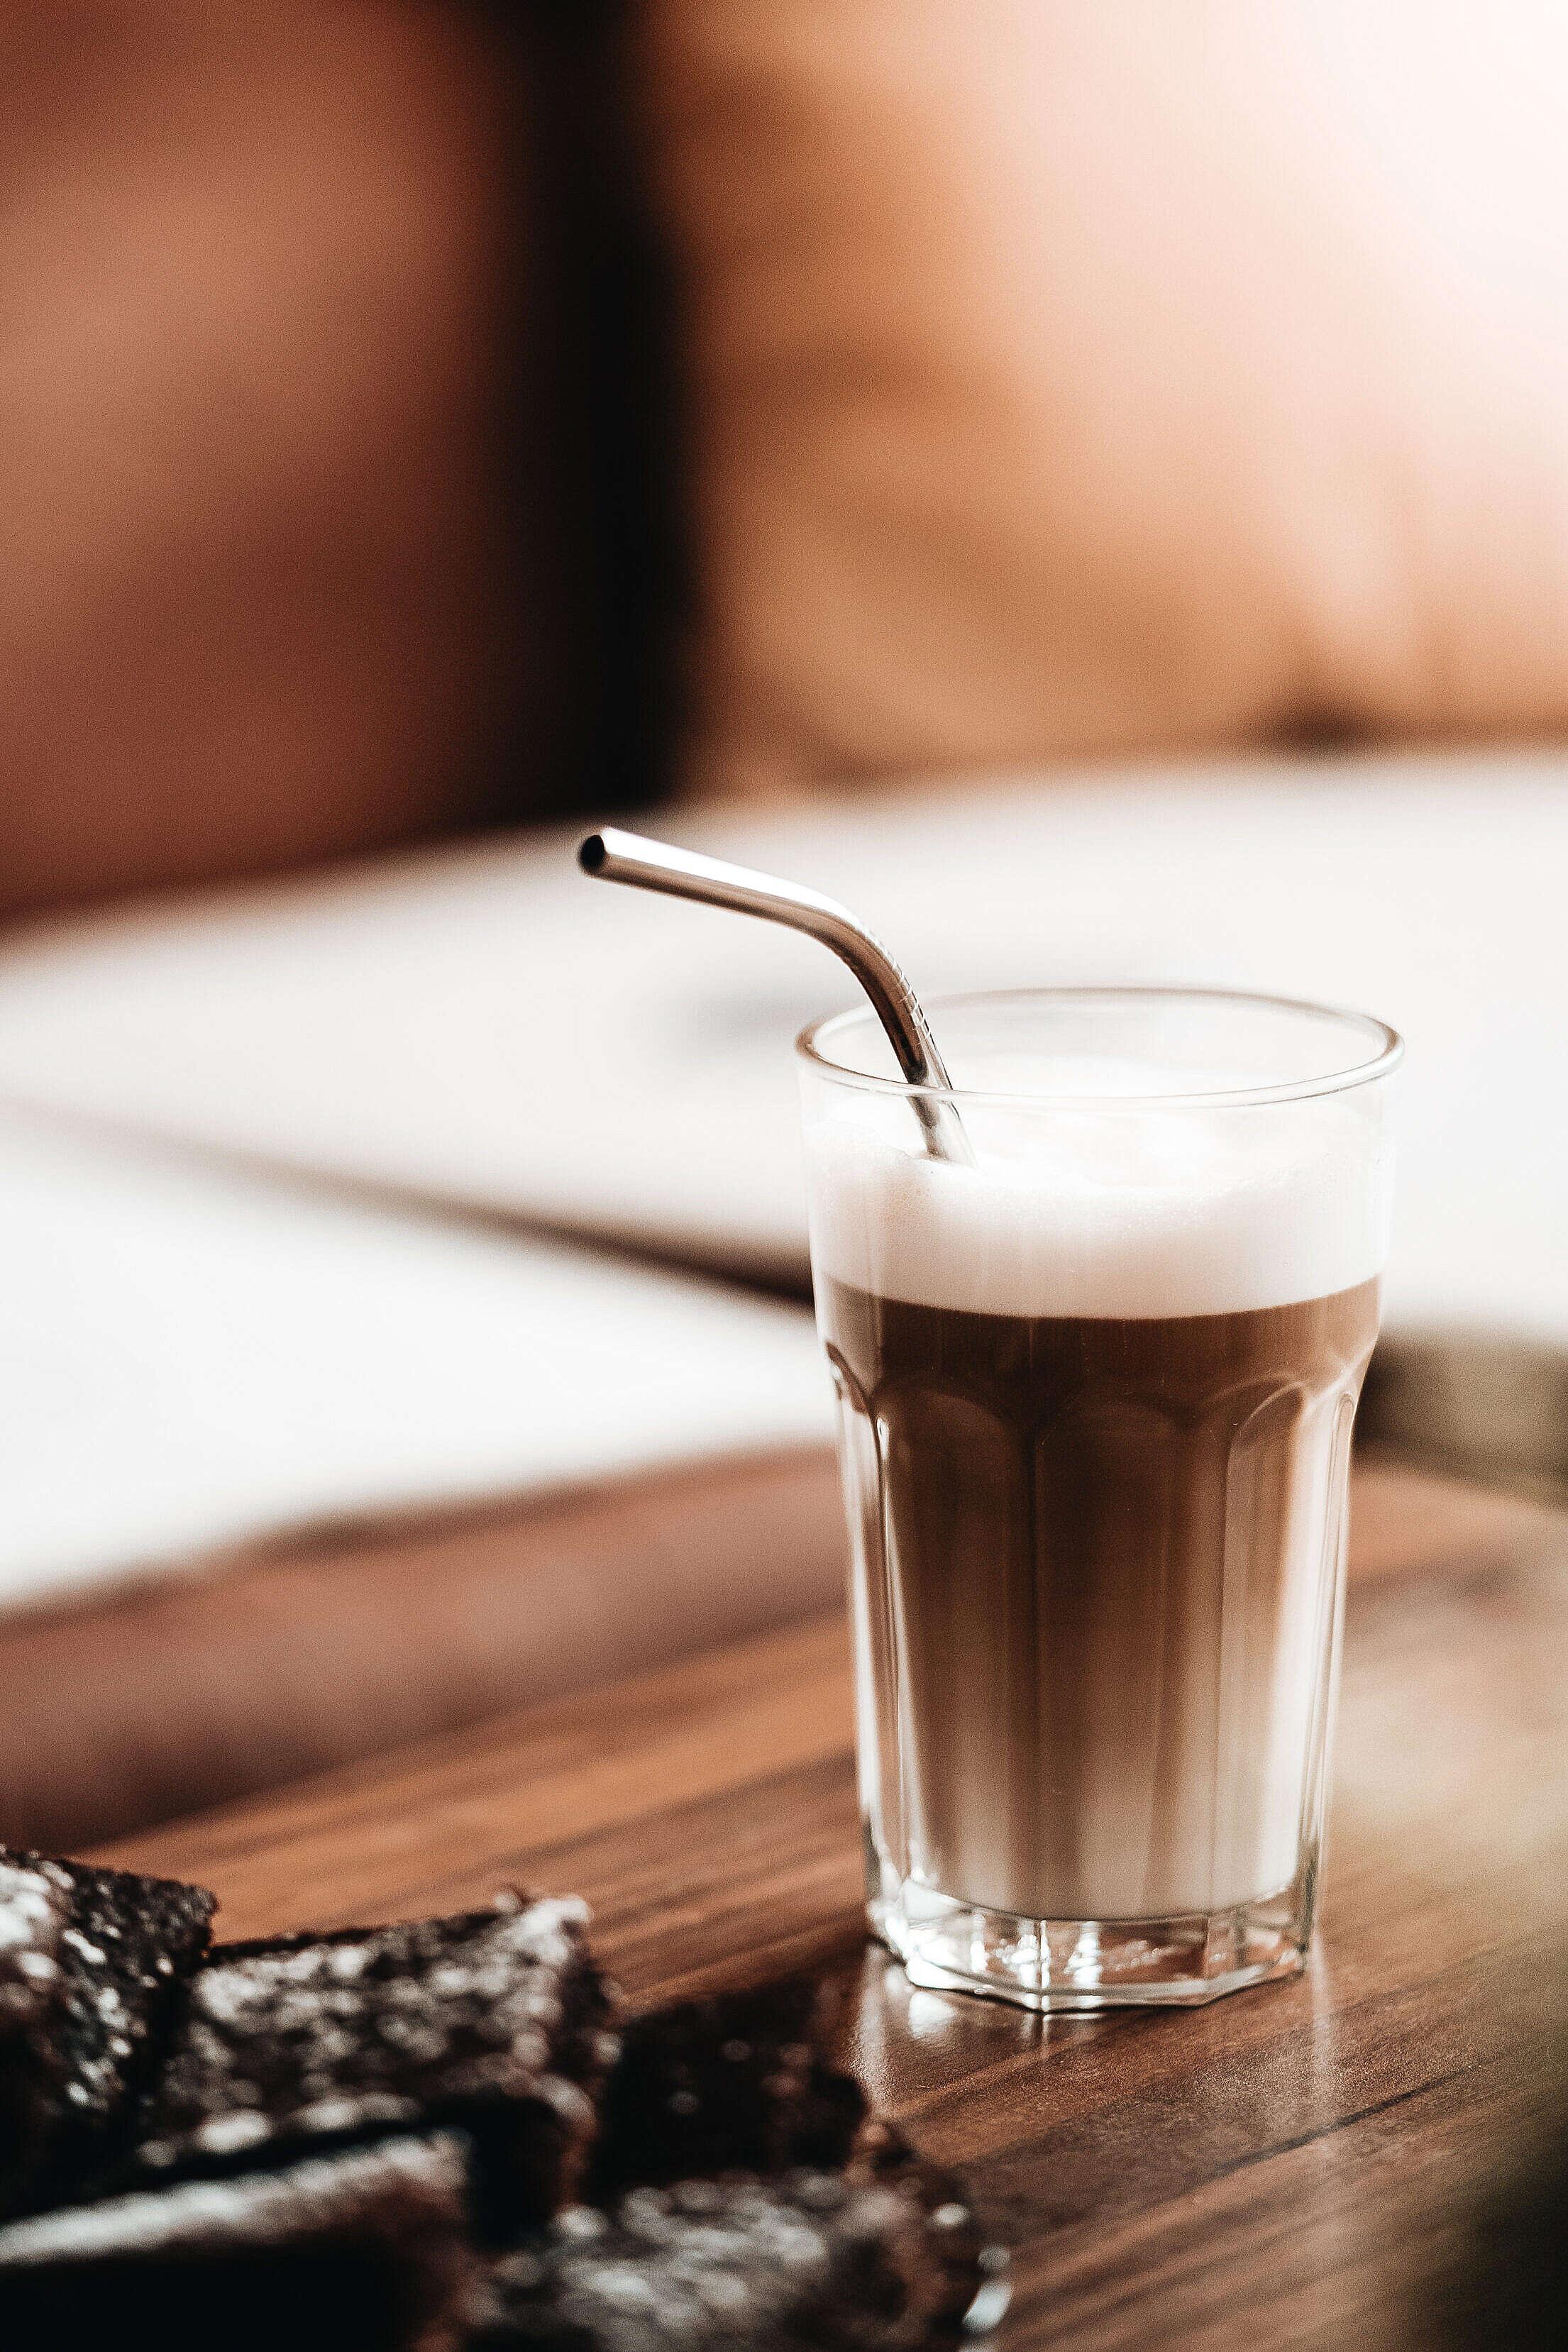 Glass of Latte Macchiato Free Stock Photo